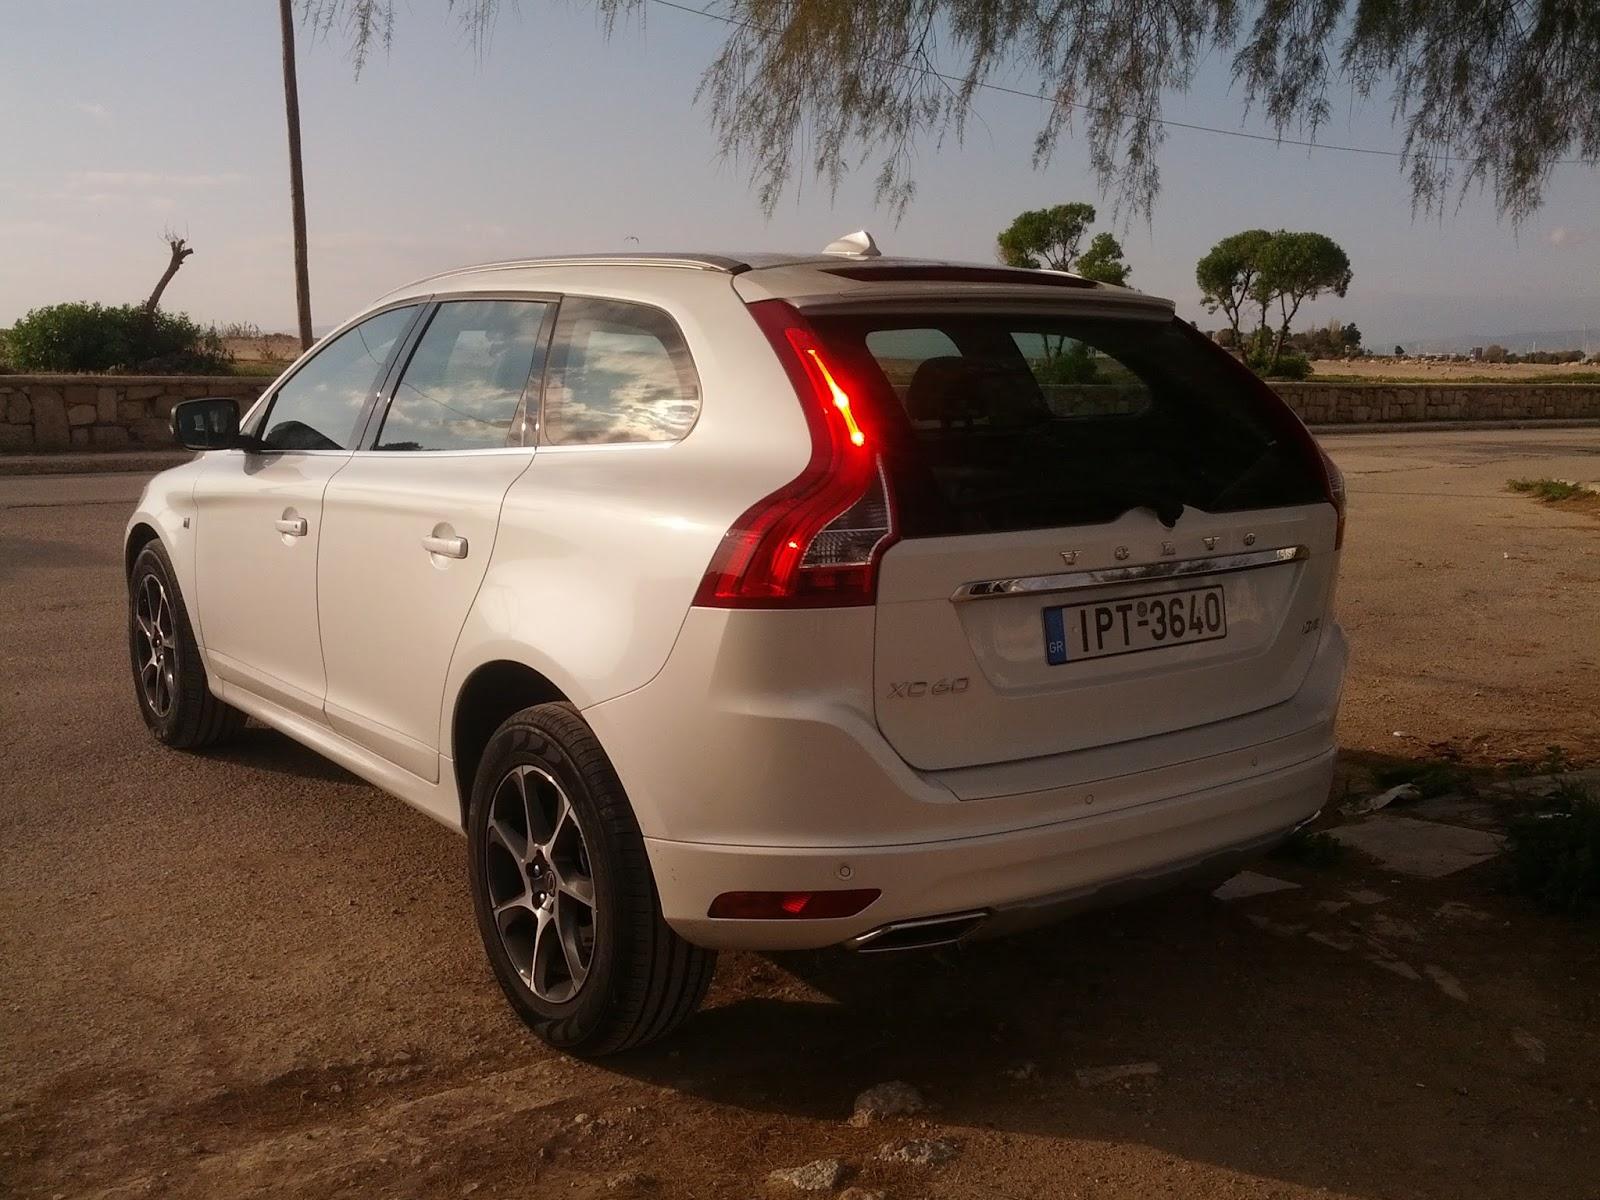 IMG 20151209 145615 Γιατί το Volvo XC60 είναι εθιστικό